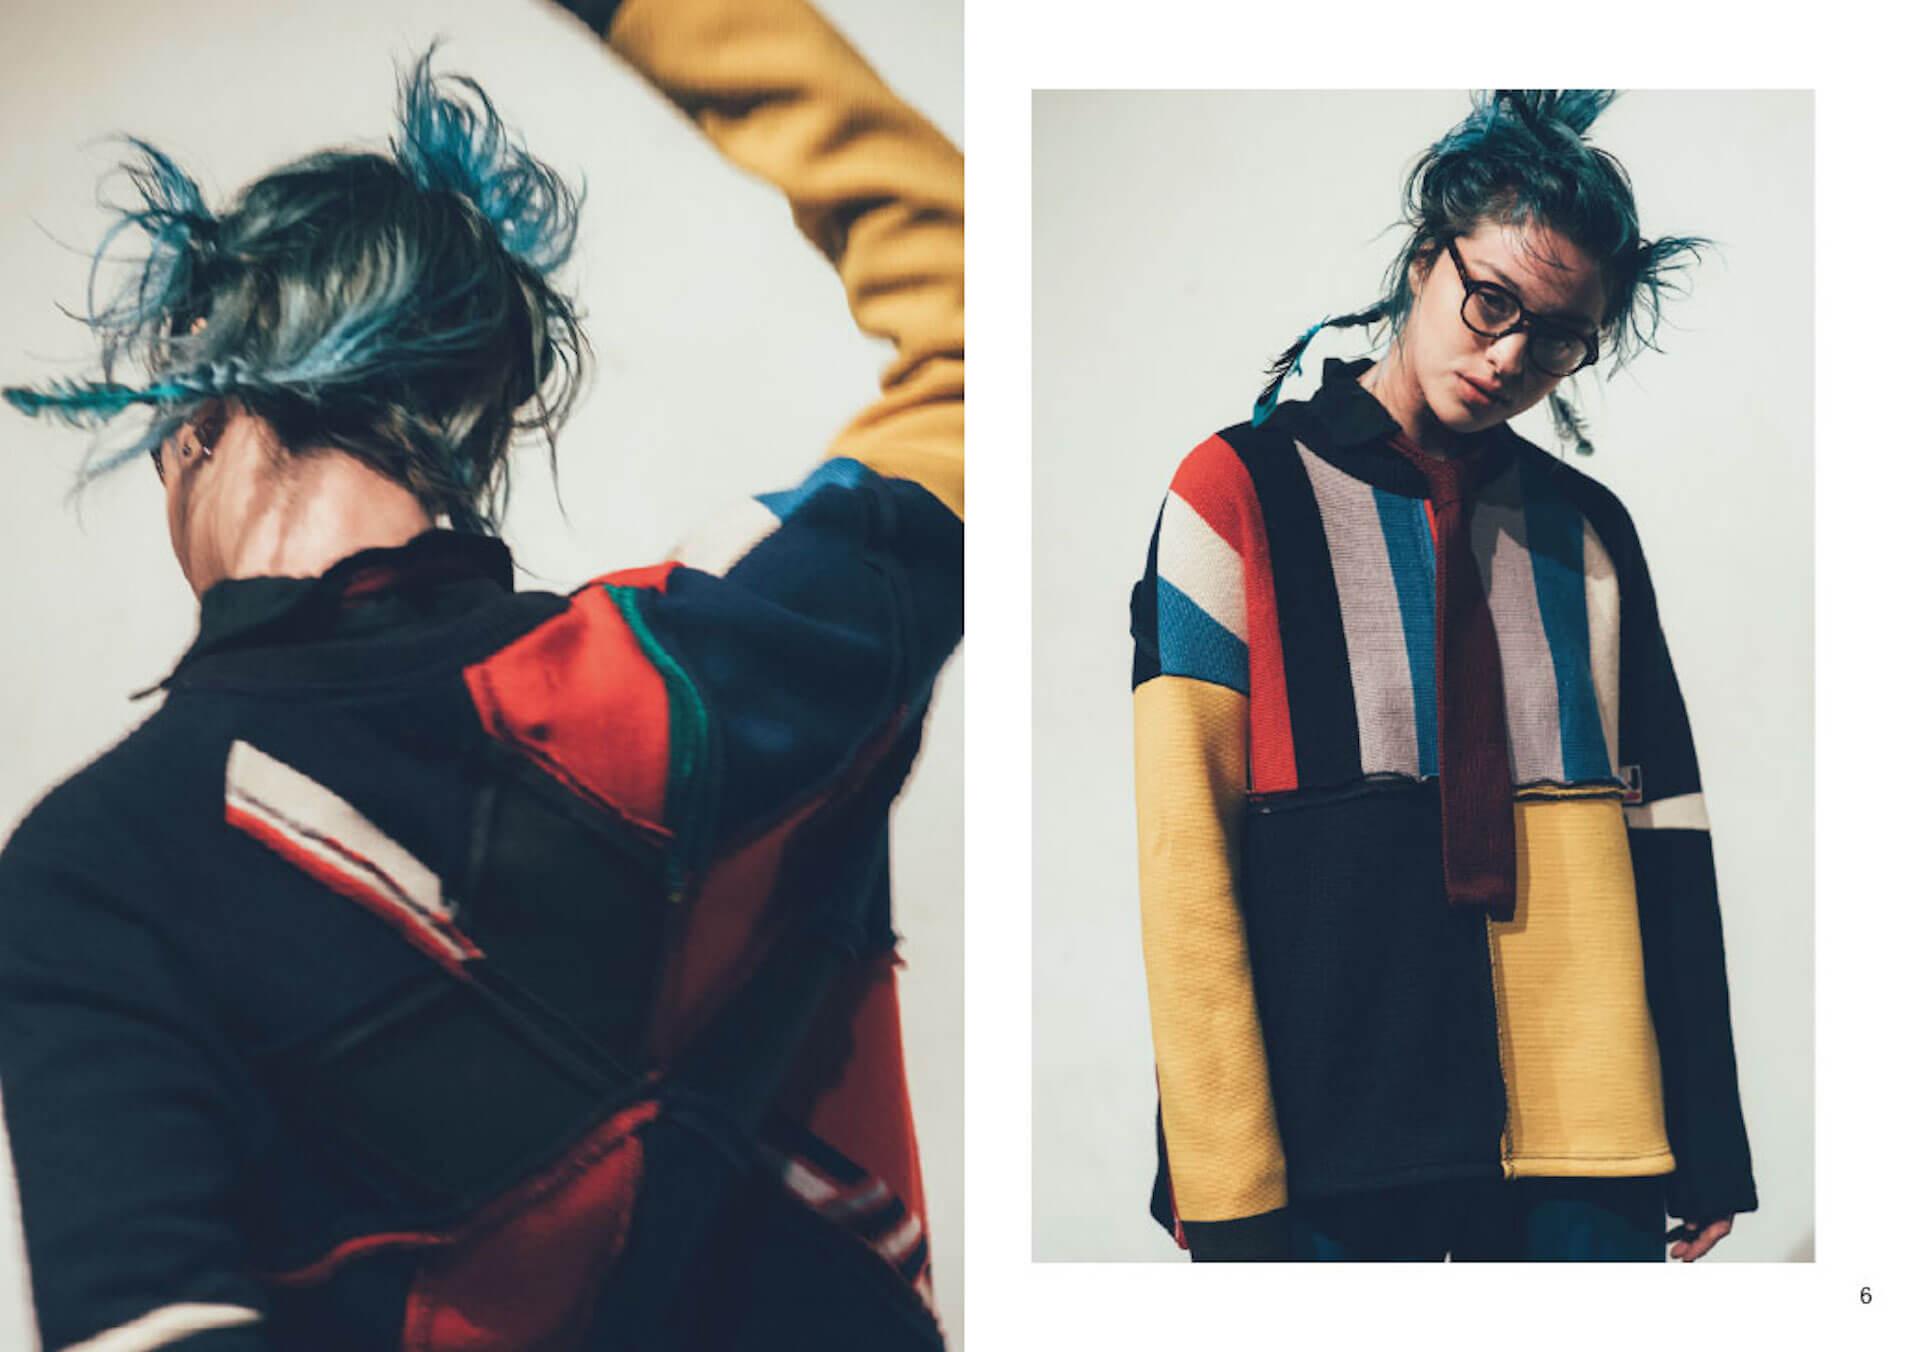 Lehの2020年秋冬コレクションがリリース|イメージモデルに山川冬樹、shimizu mash、elena midoriを起用。コレクションの撮影は水谷太郎。 life_fashion200913-leh-romantic-2